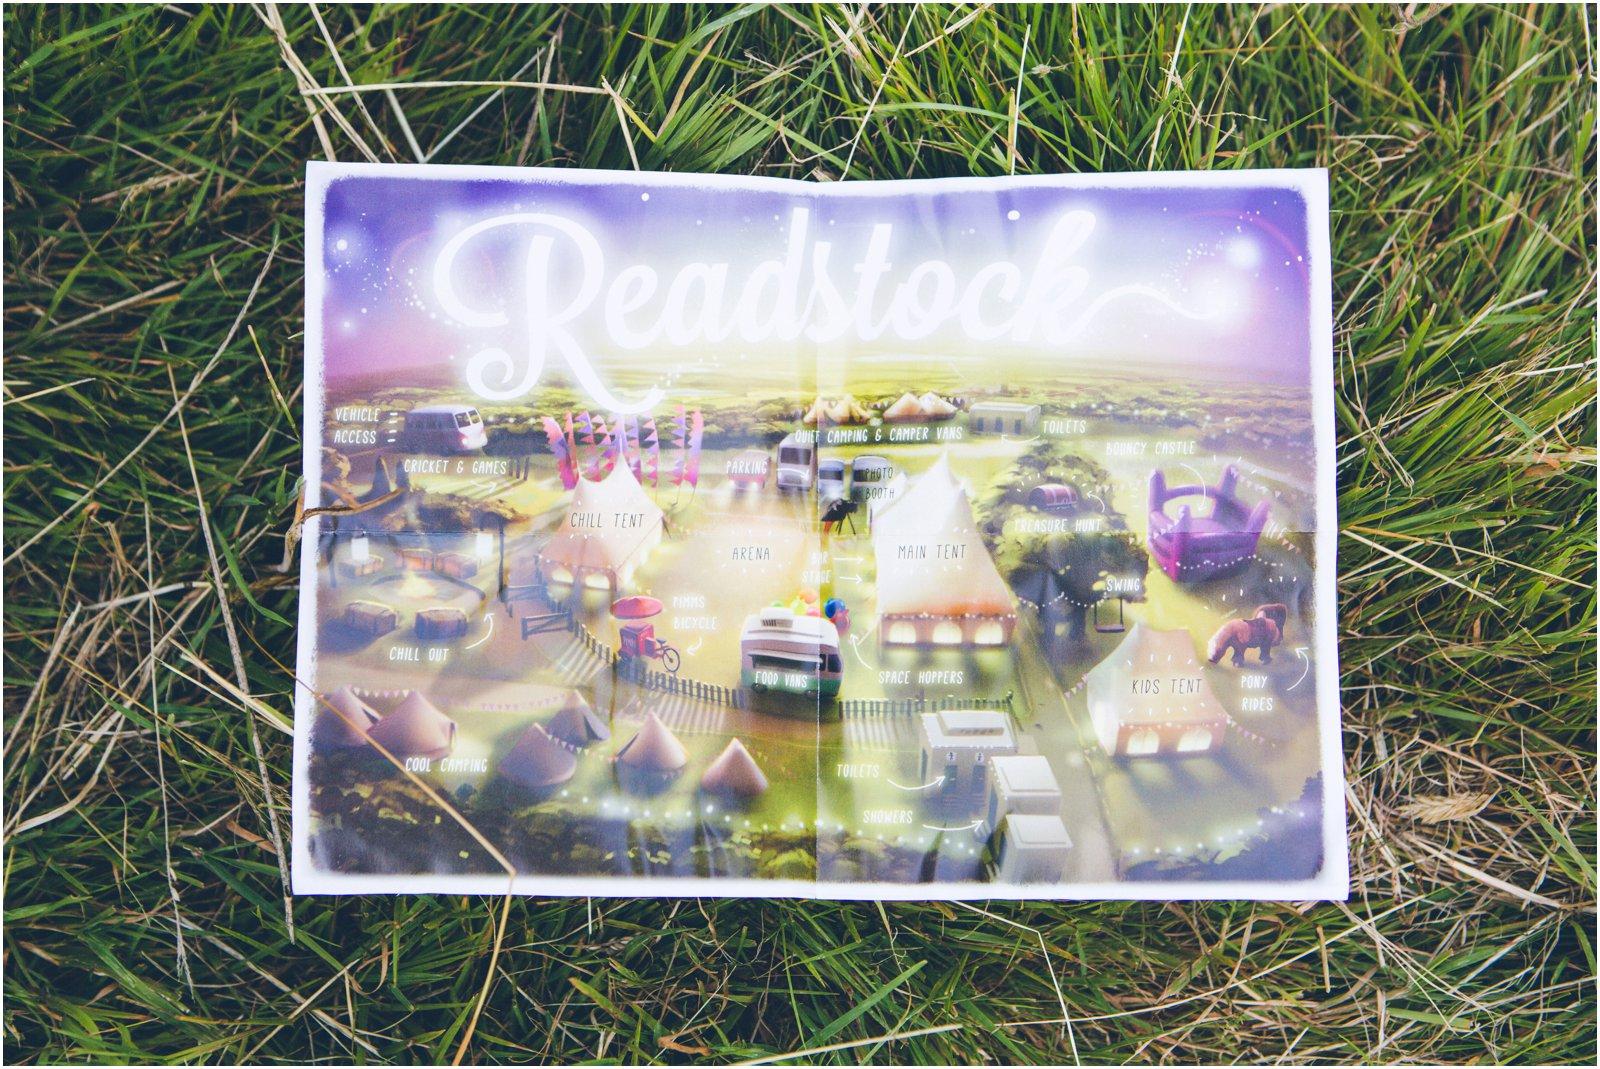 Sally and Damien's wedding festival by Summertown Pictures-12_DerrynSchmidt